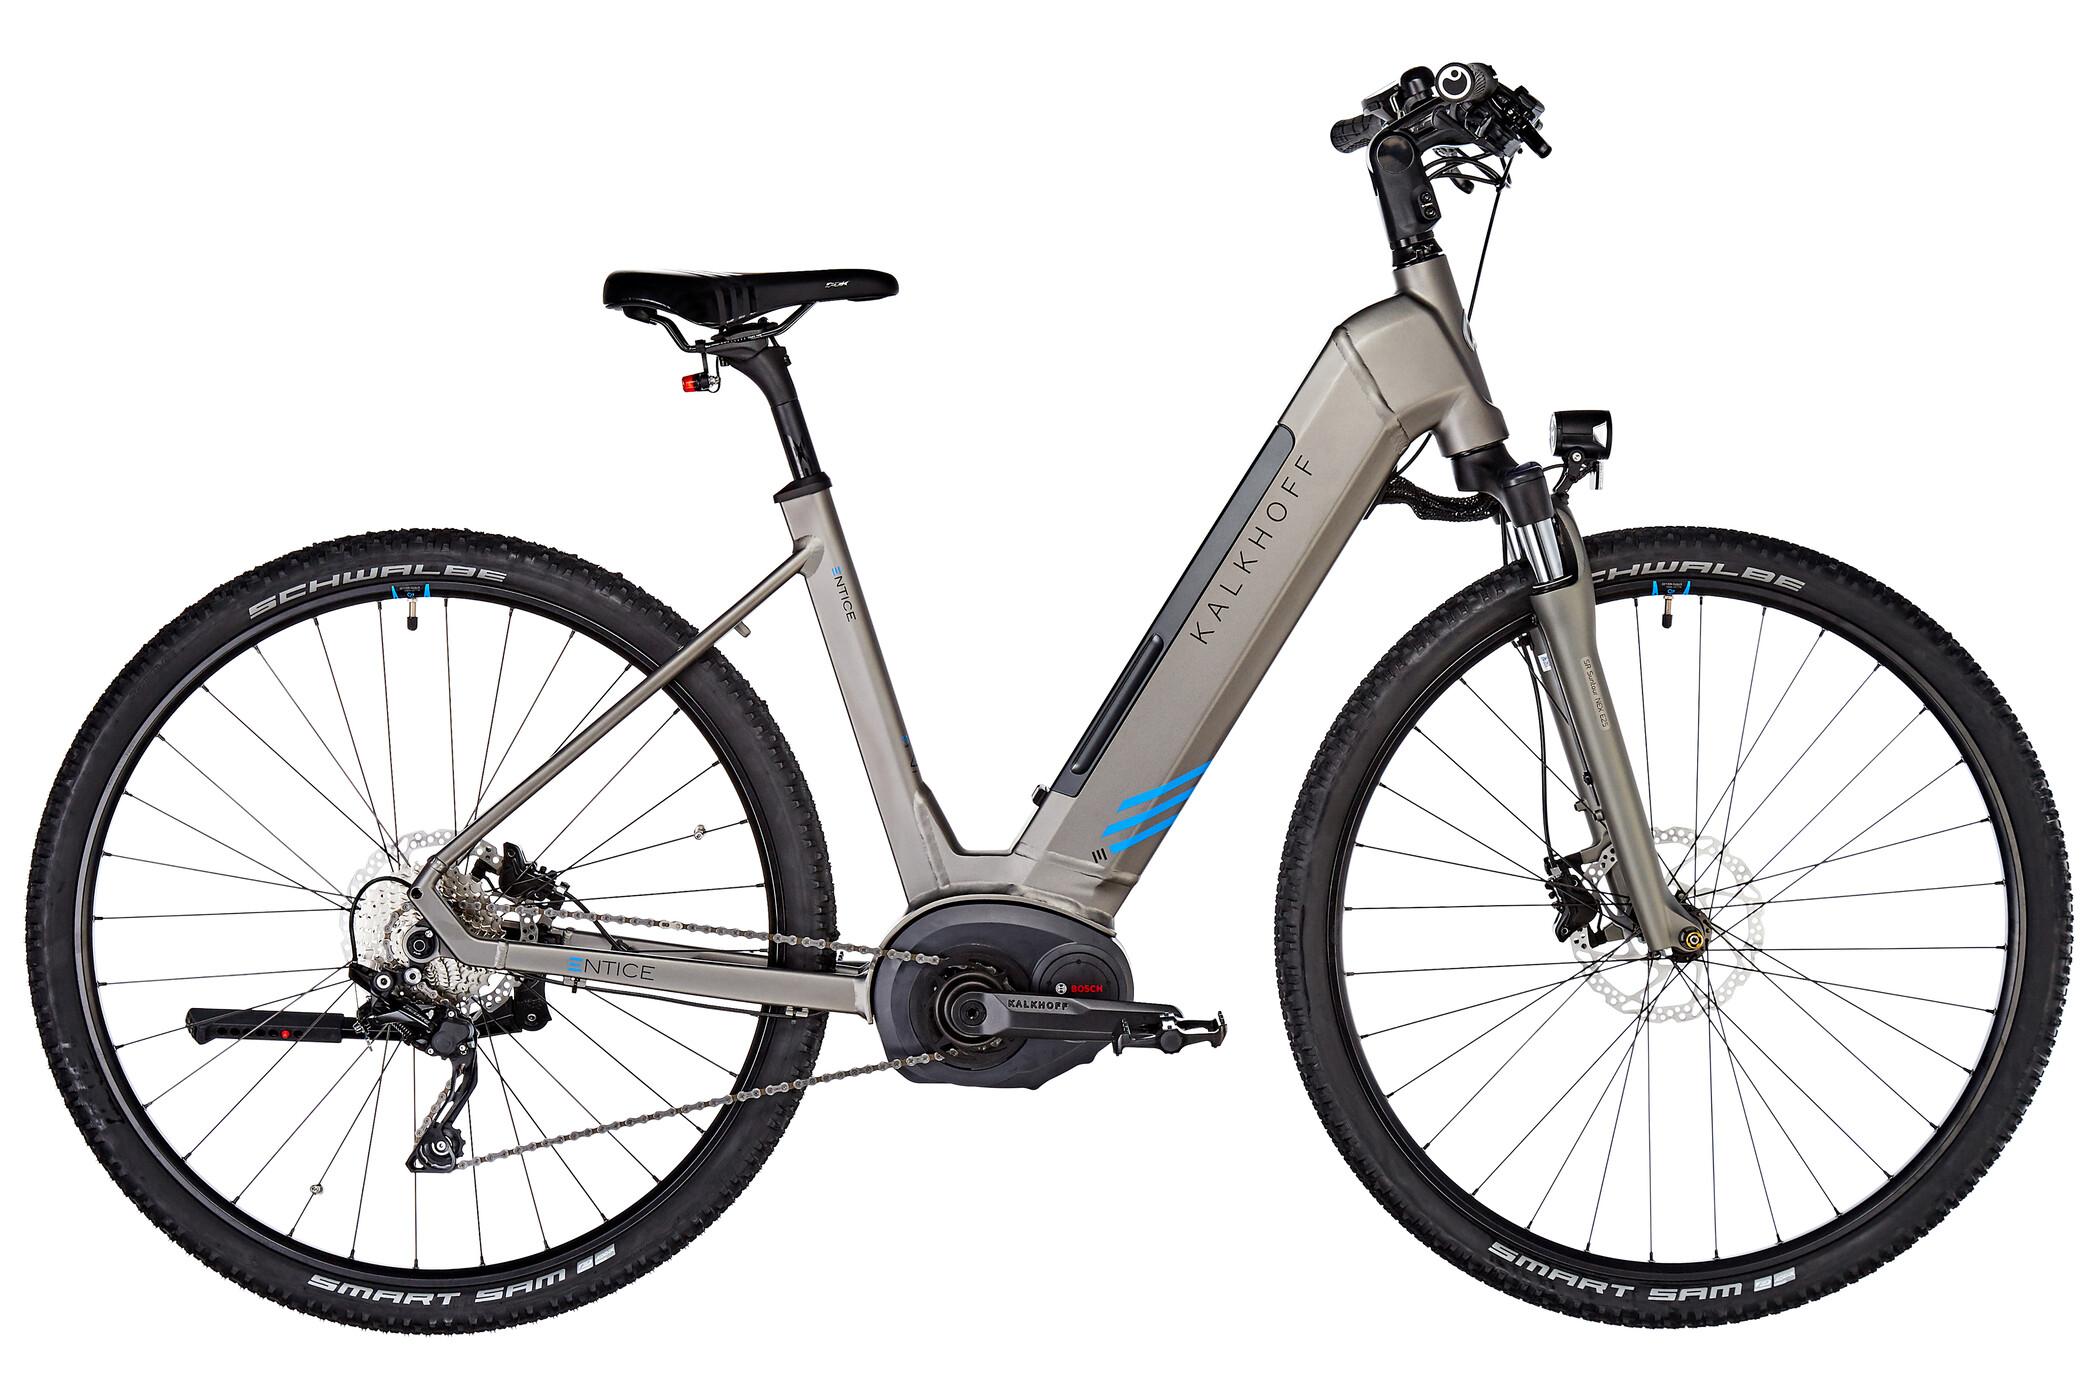 Kalkhoff Entice 5.B Advance Wave 500Wh, torontogrey matt | City-cykler